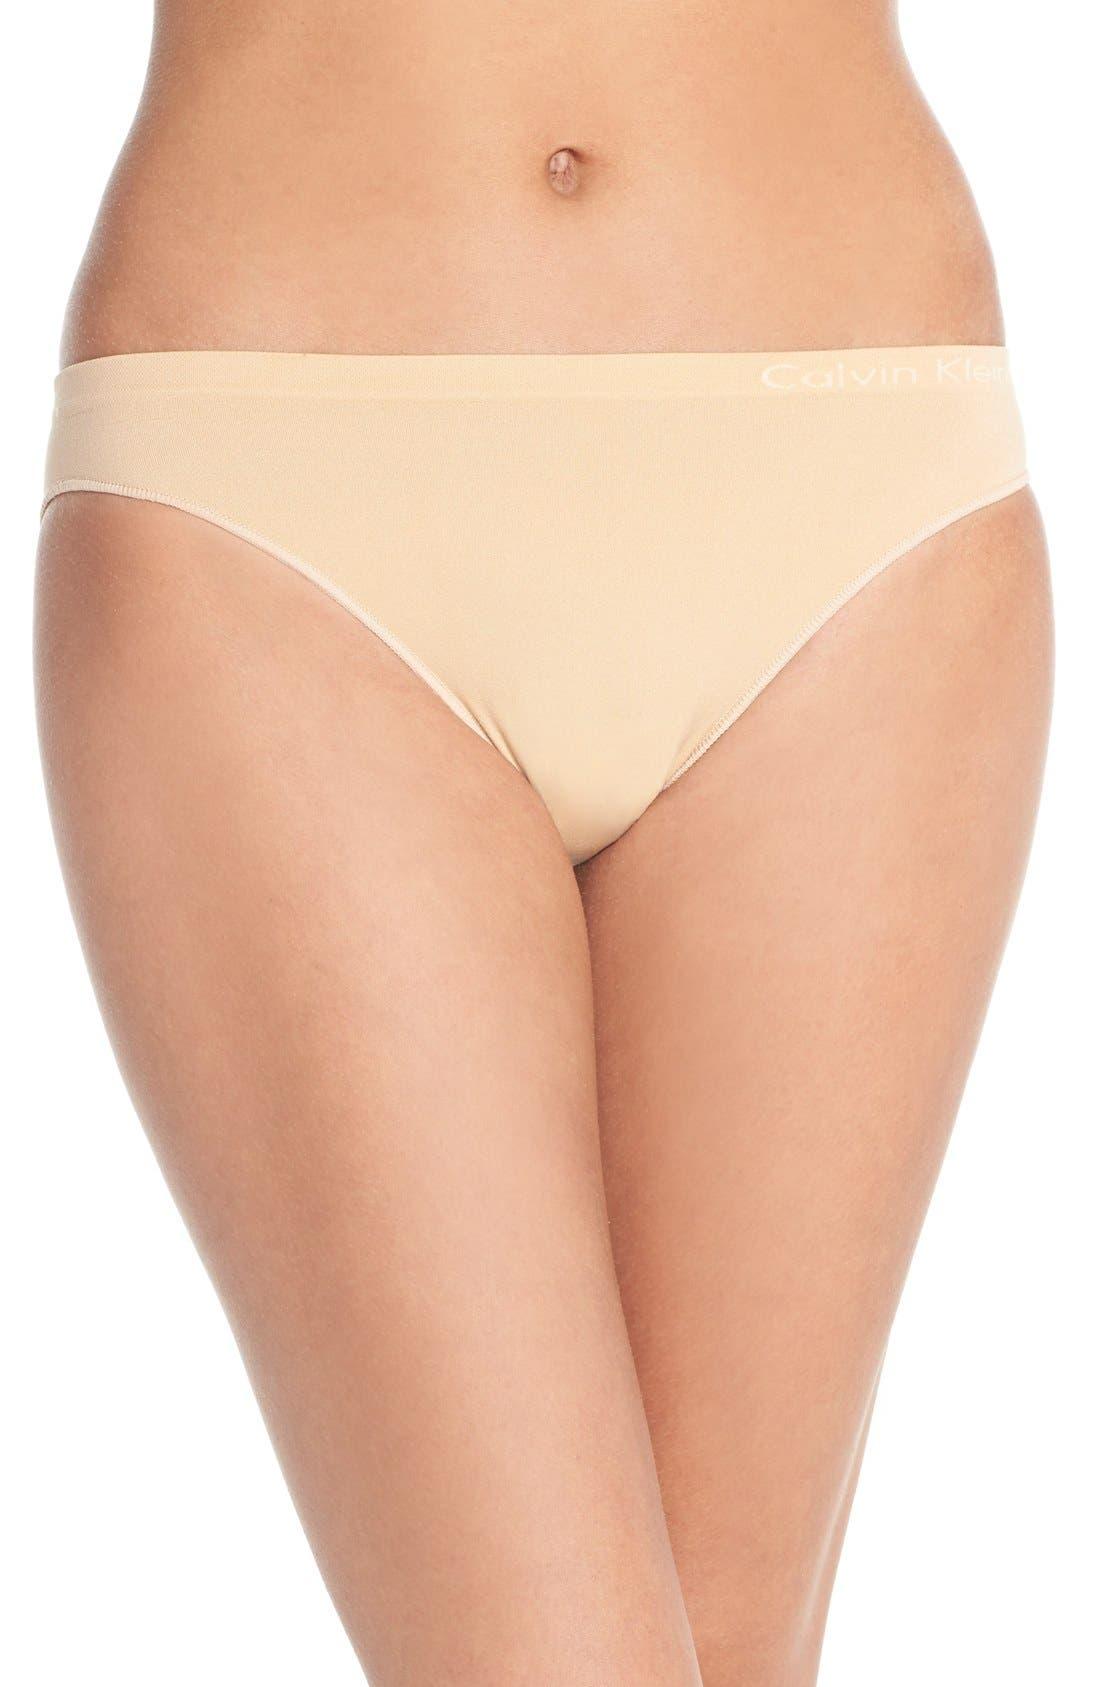 Main Image - Calvin Klein 'Pure' Seamless Bikini (3 for $33)